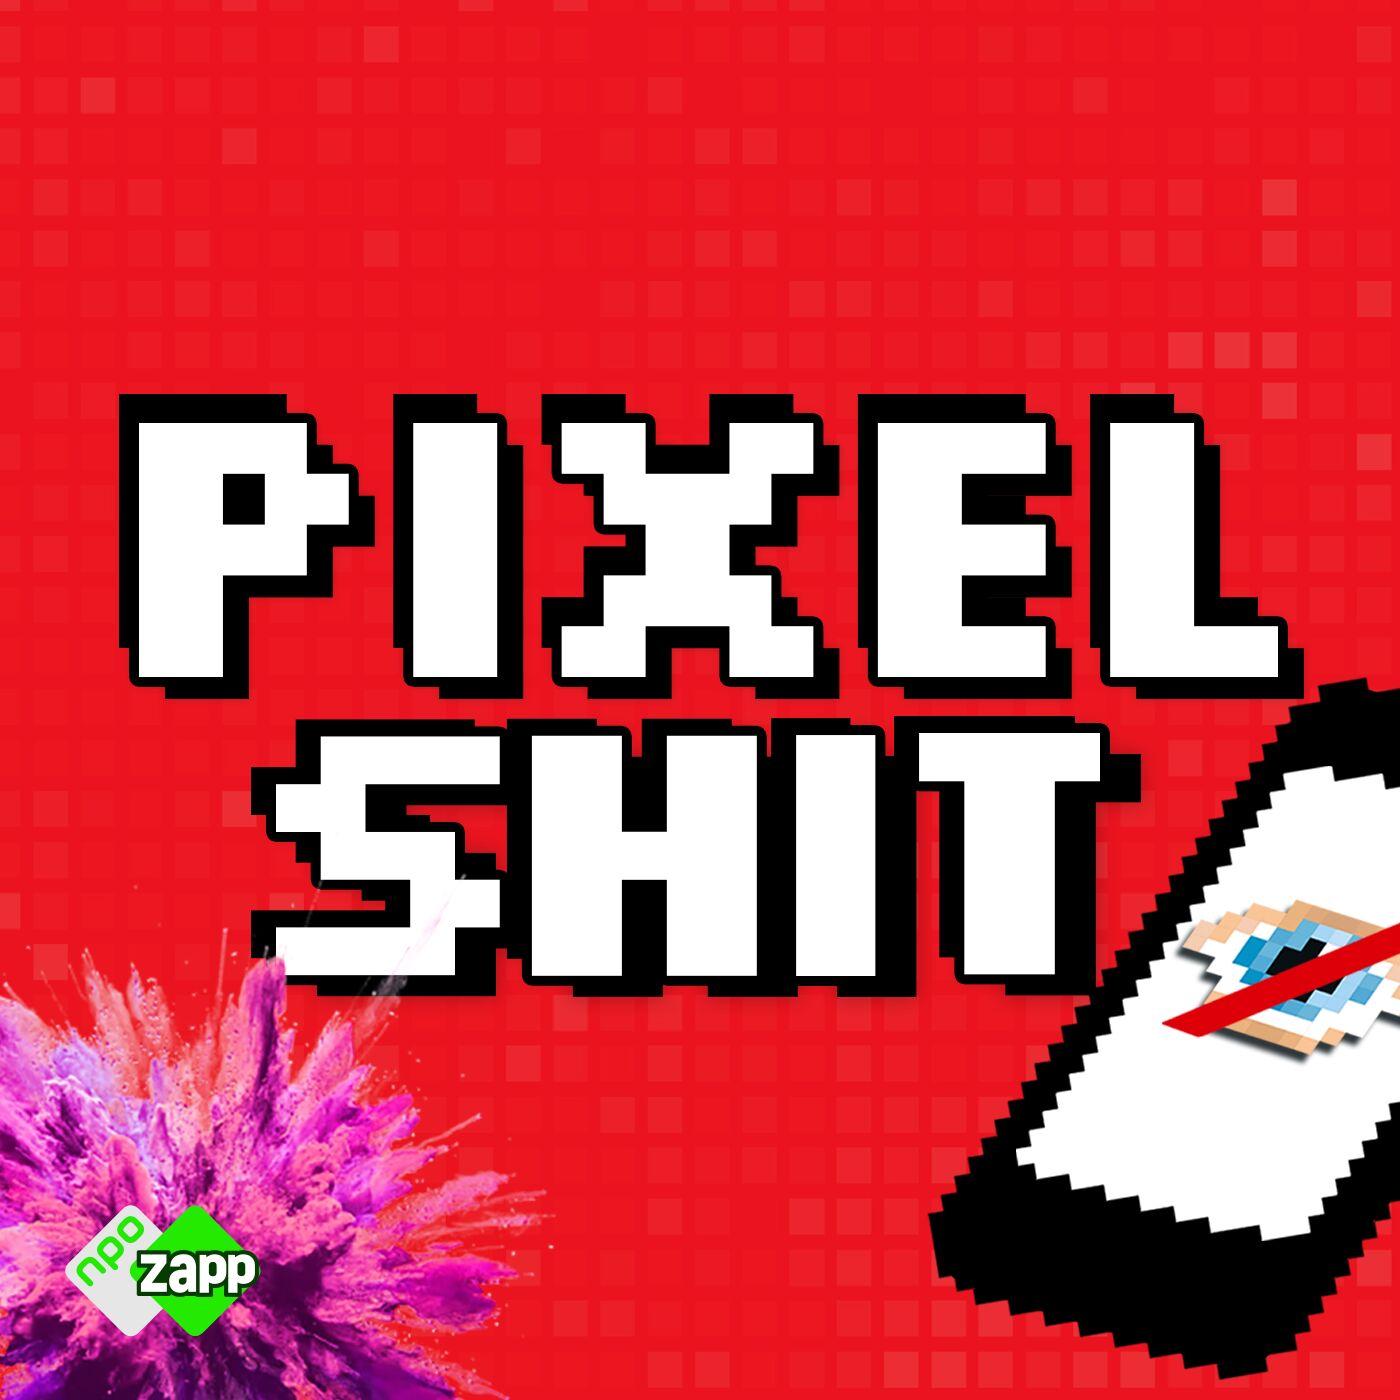 Pixelshit logo